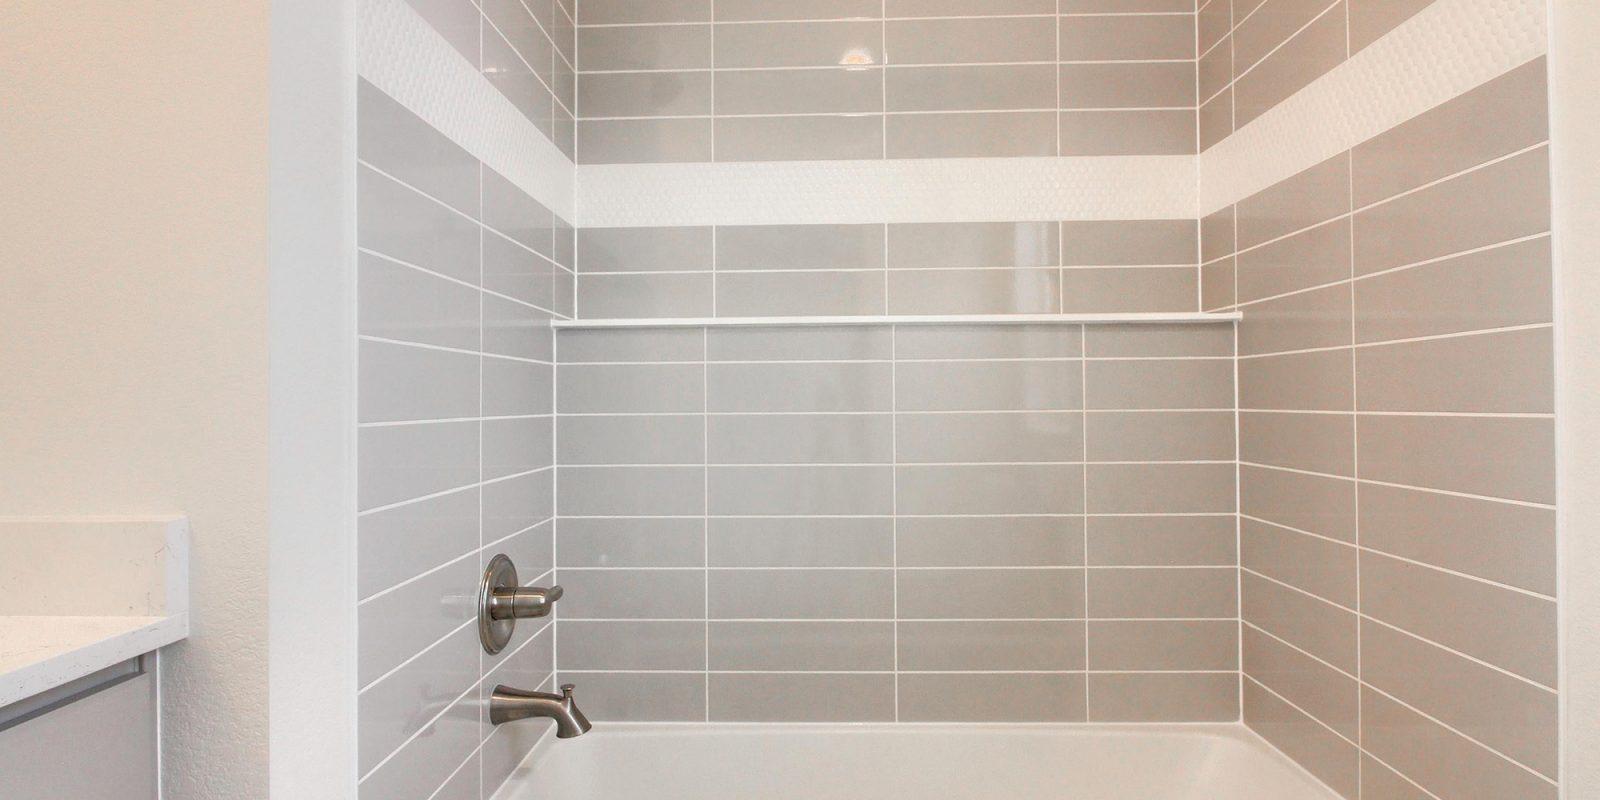 Arista: Uptown - Secondary Bathroom